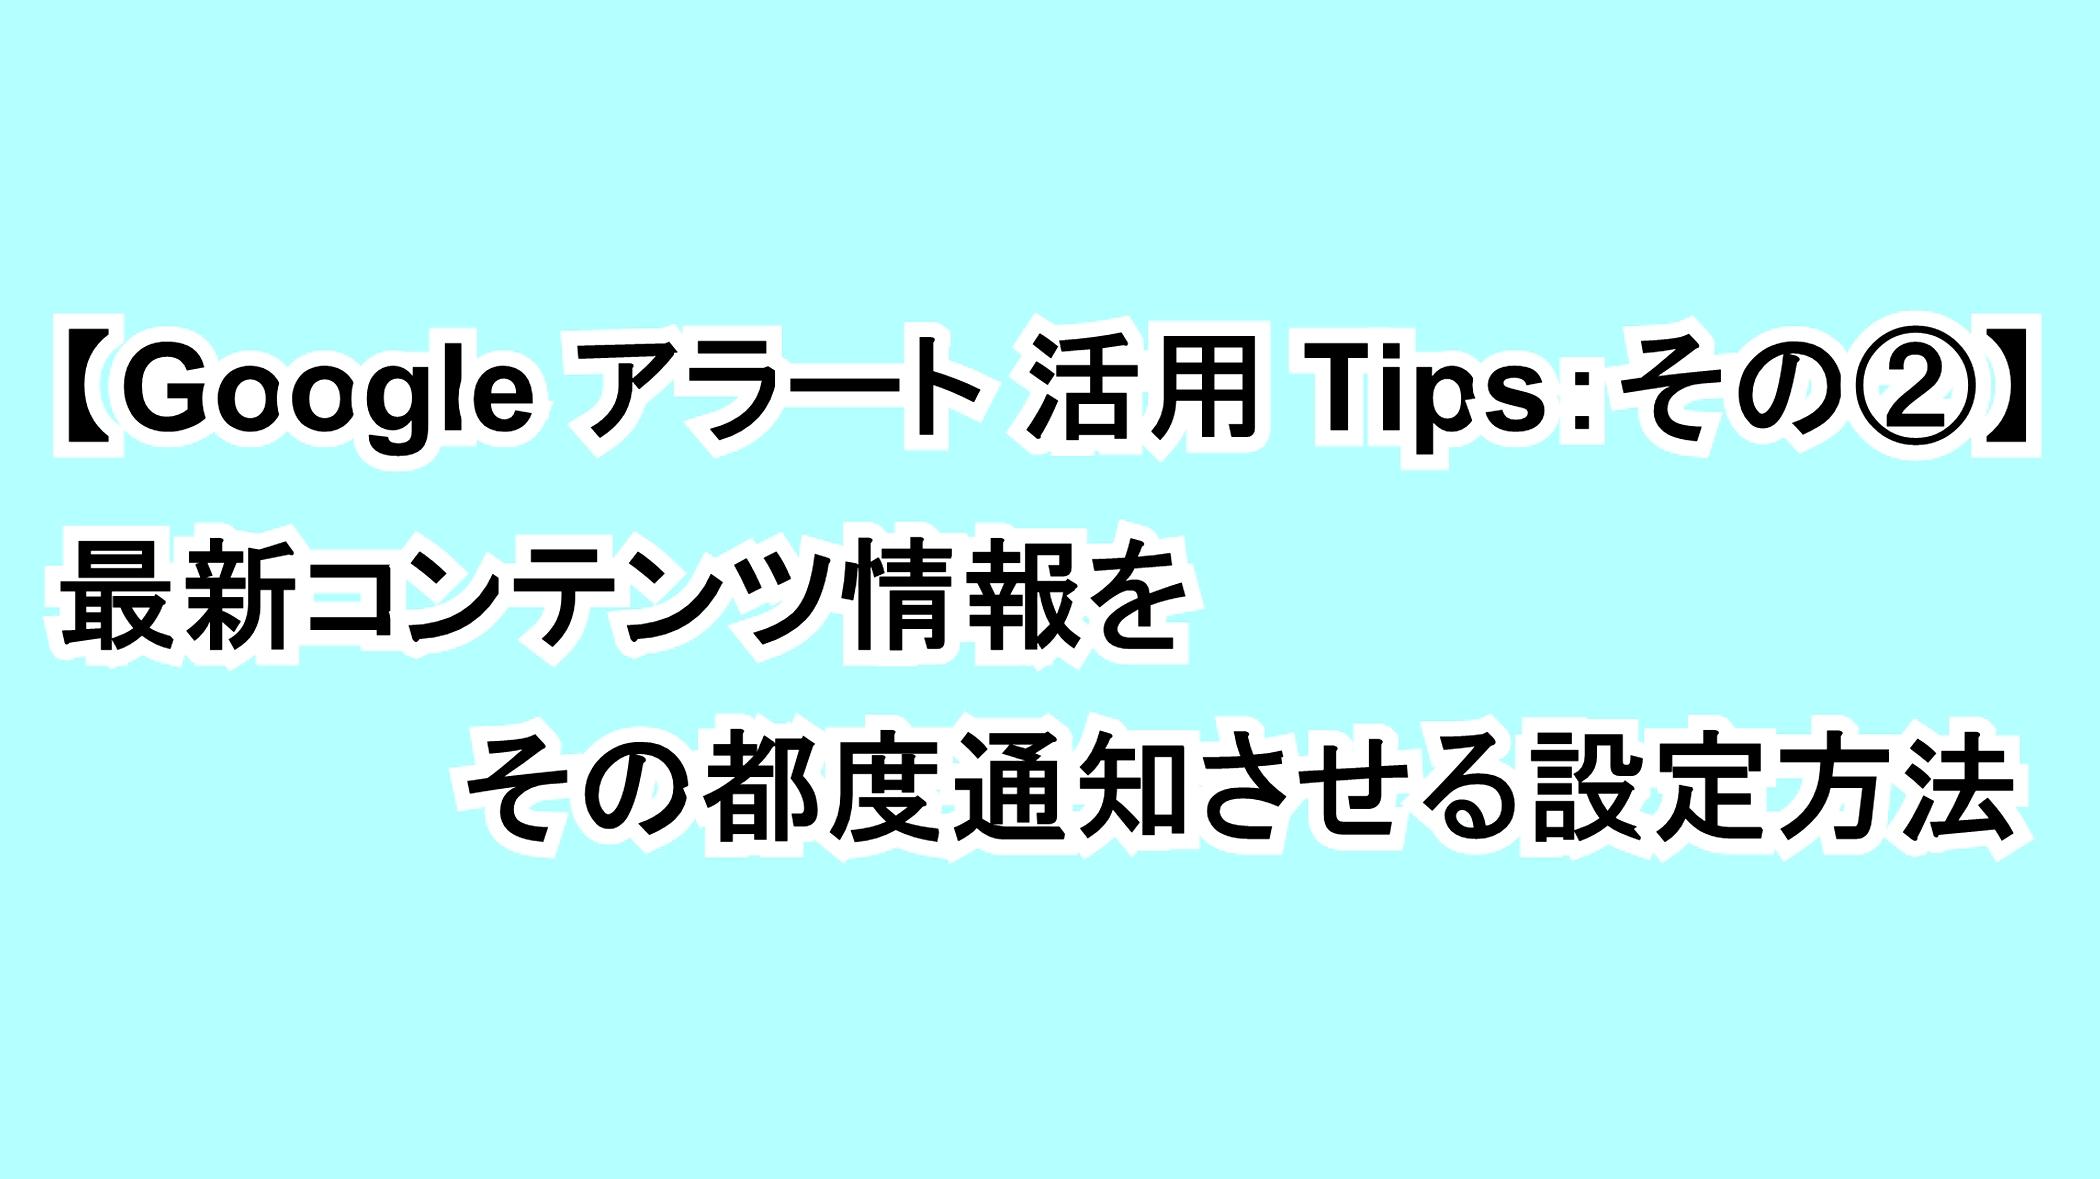 【Googleアラート活用Tips:その②】最新コンテンツ情報をその都度通知させる設定方法